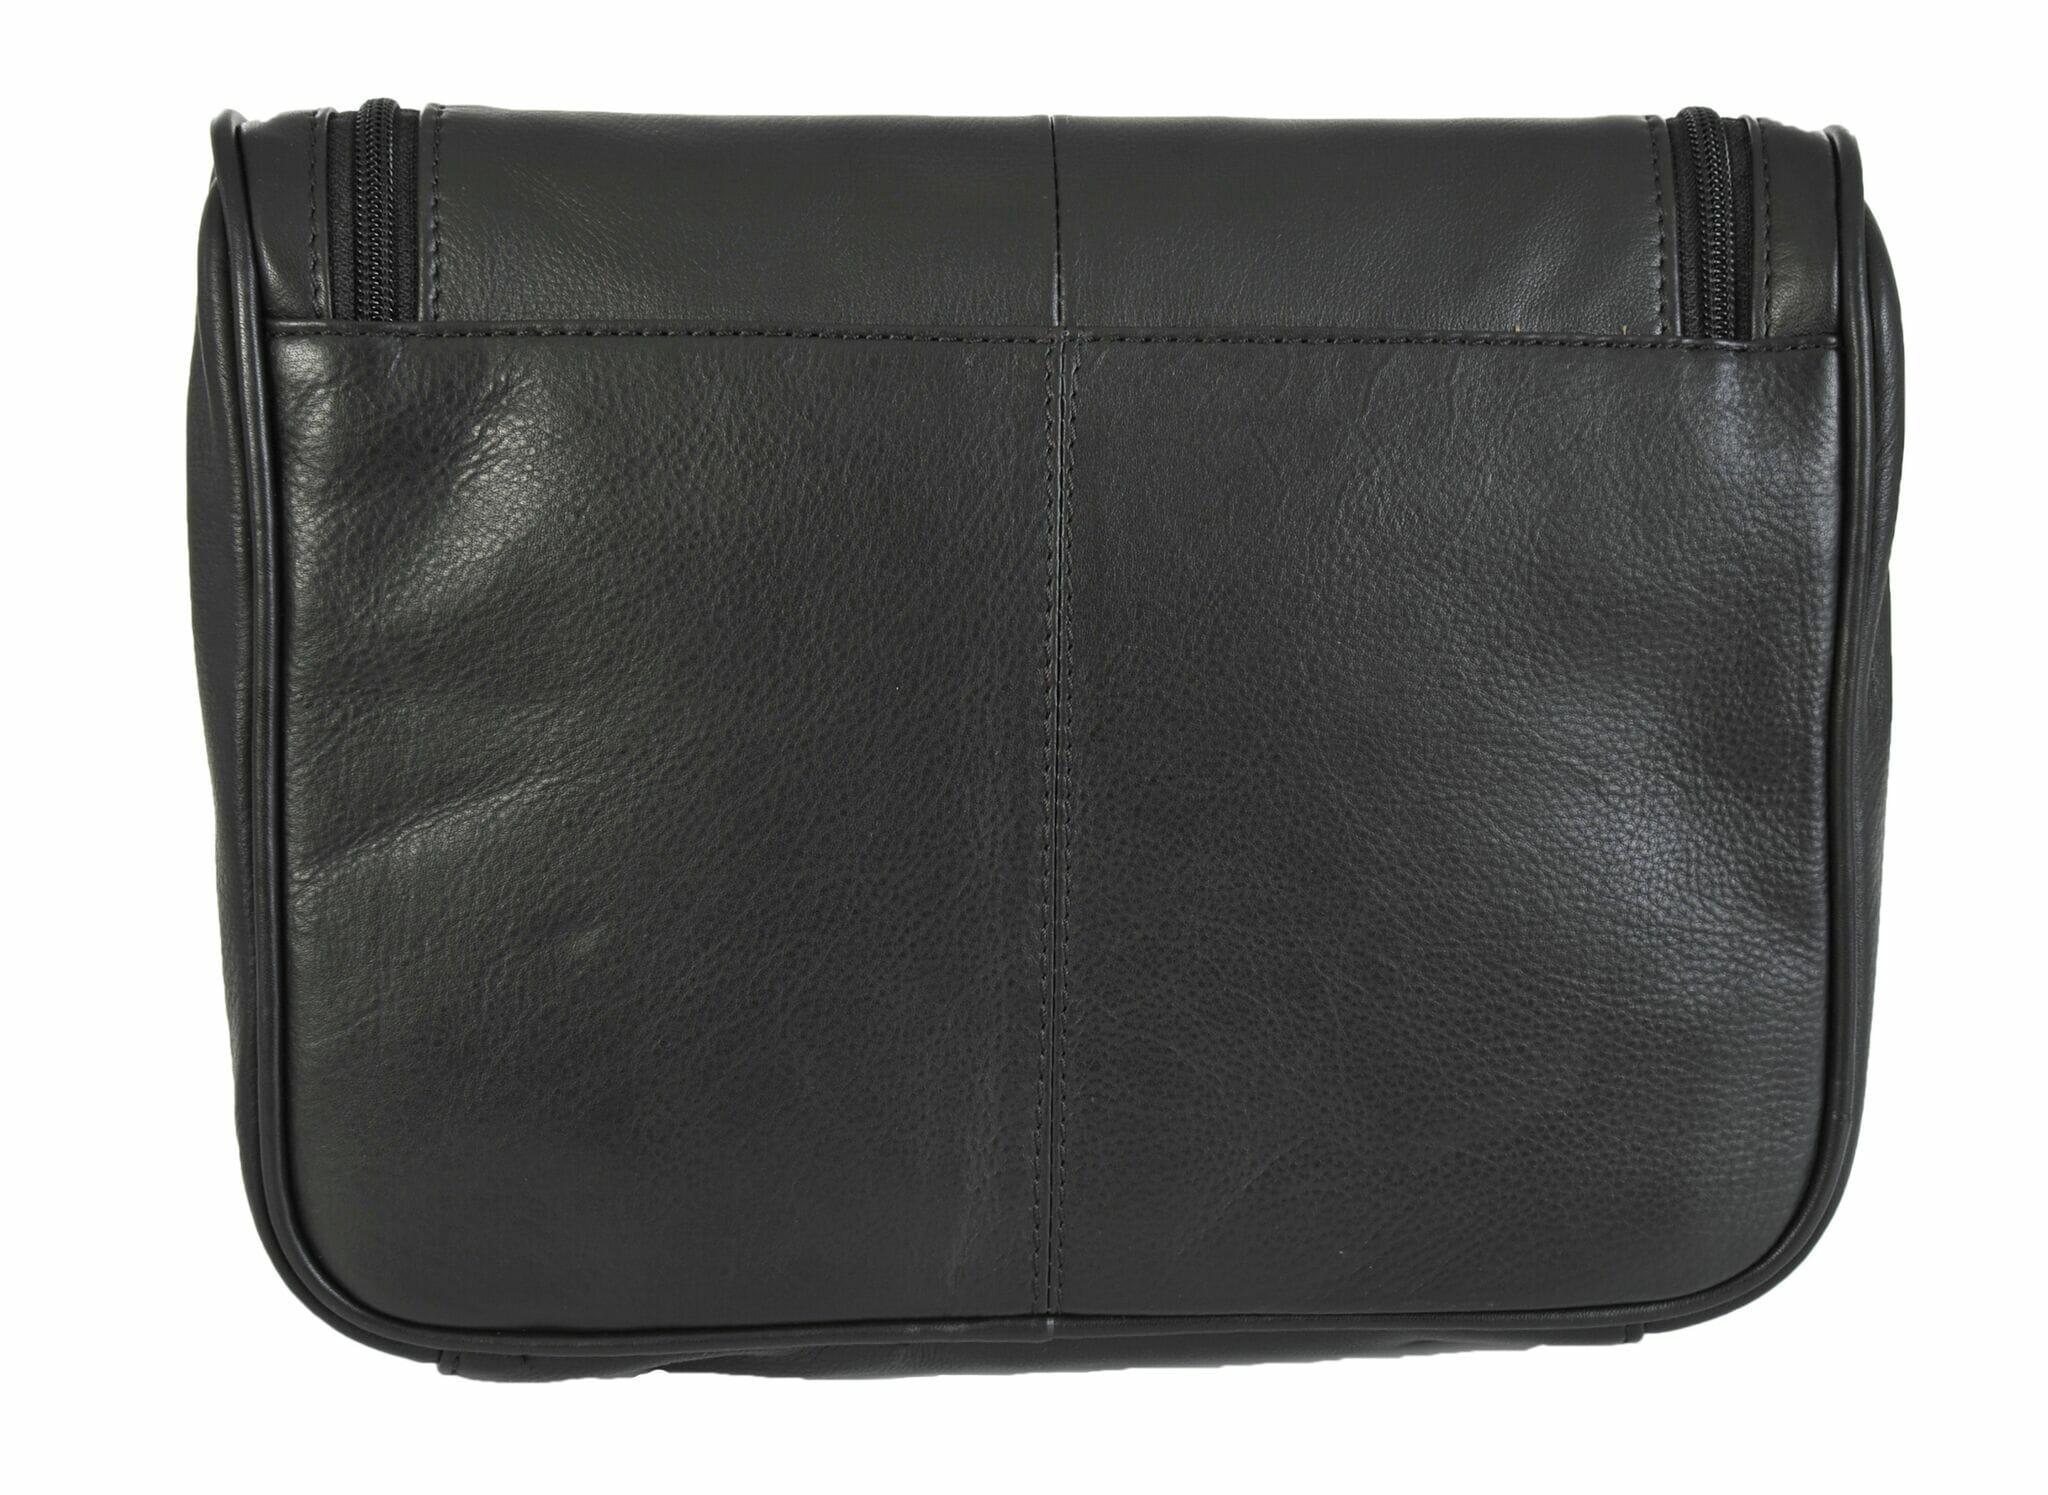 5e8bdcb67dff Rowallan Mens Black Soft Leather Hanging Washbag 9789 - David ...